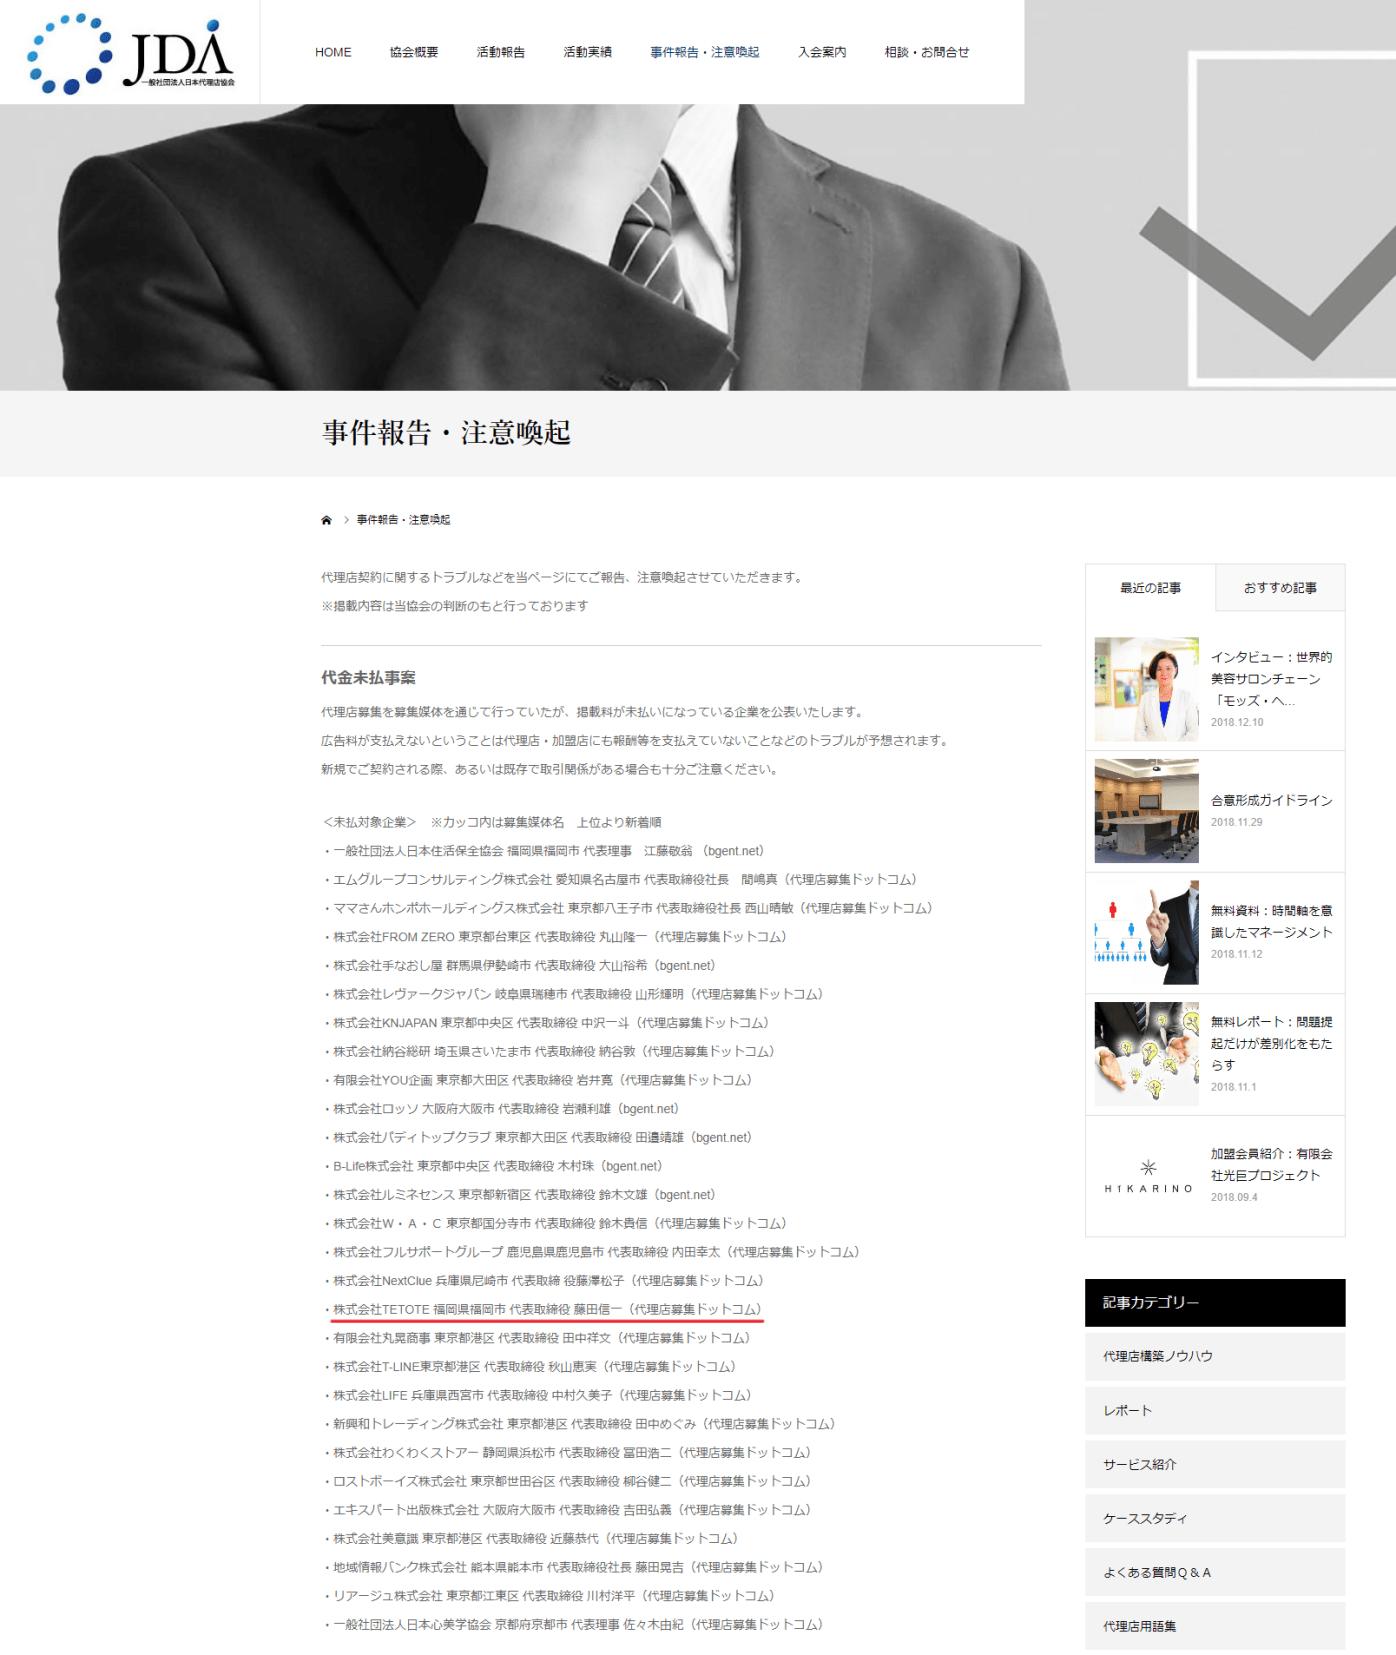 JDB 事件報告・注意喚起